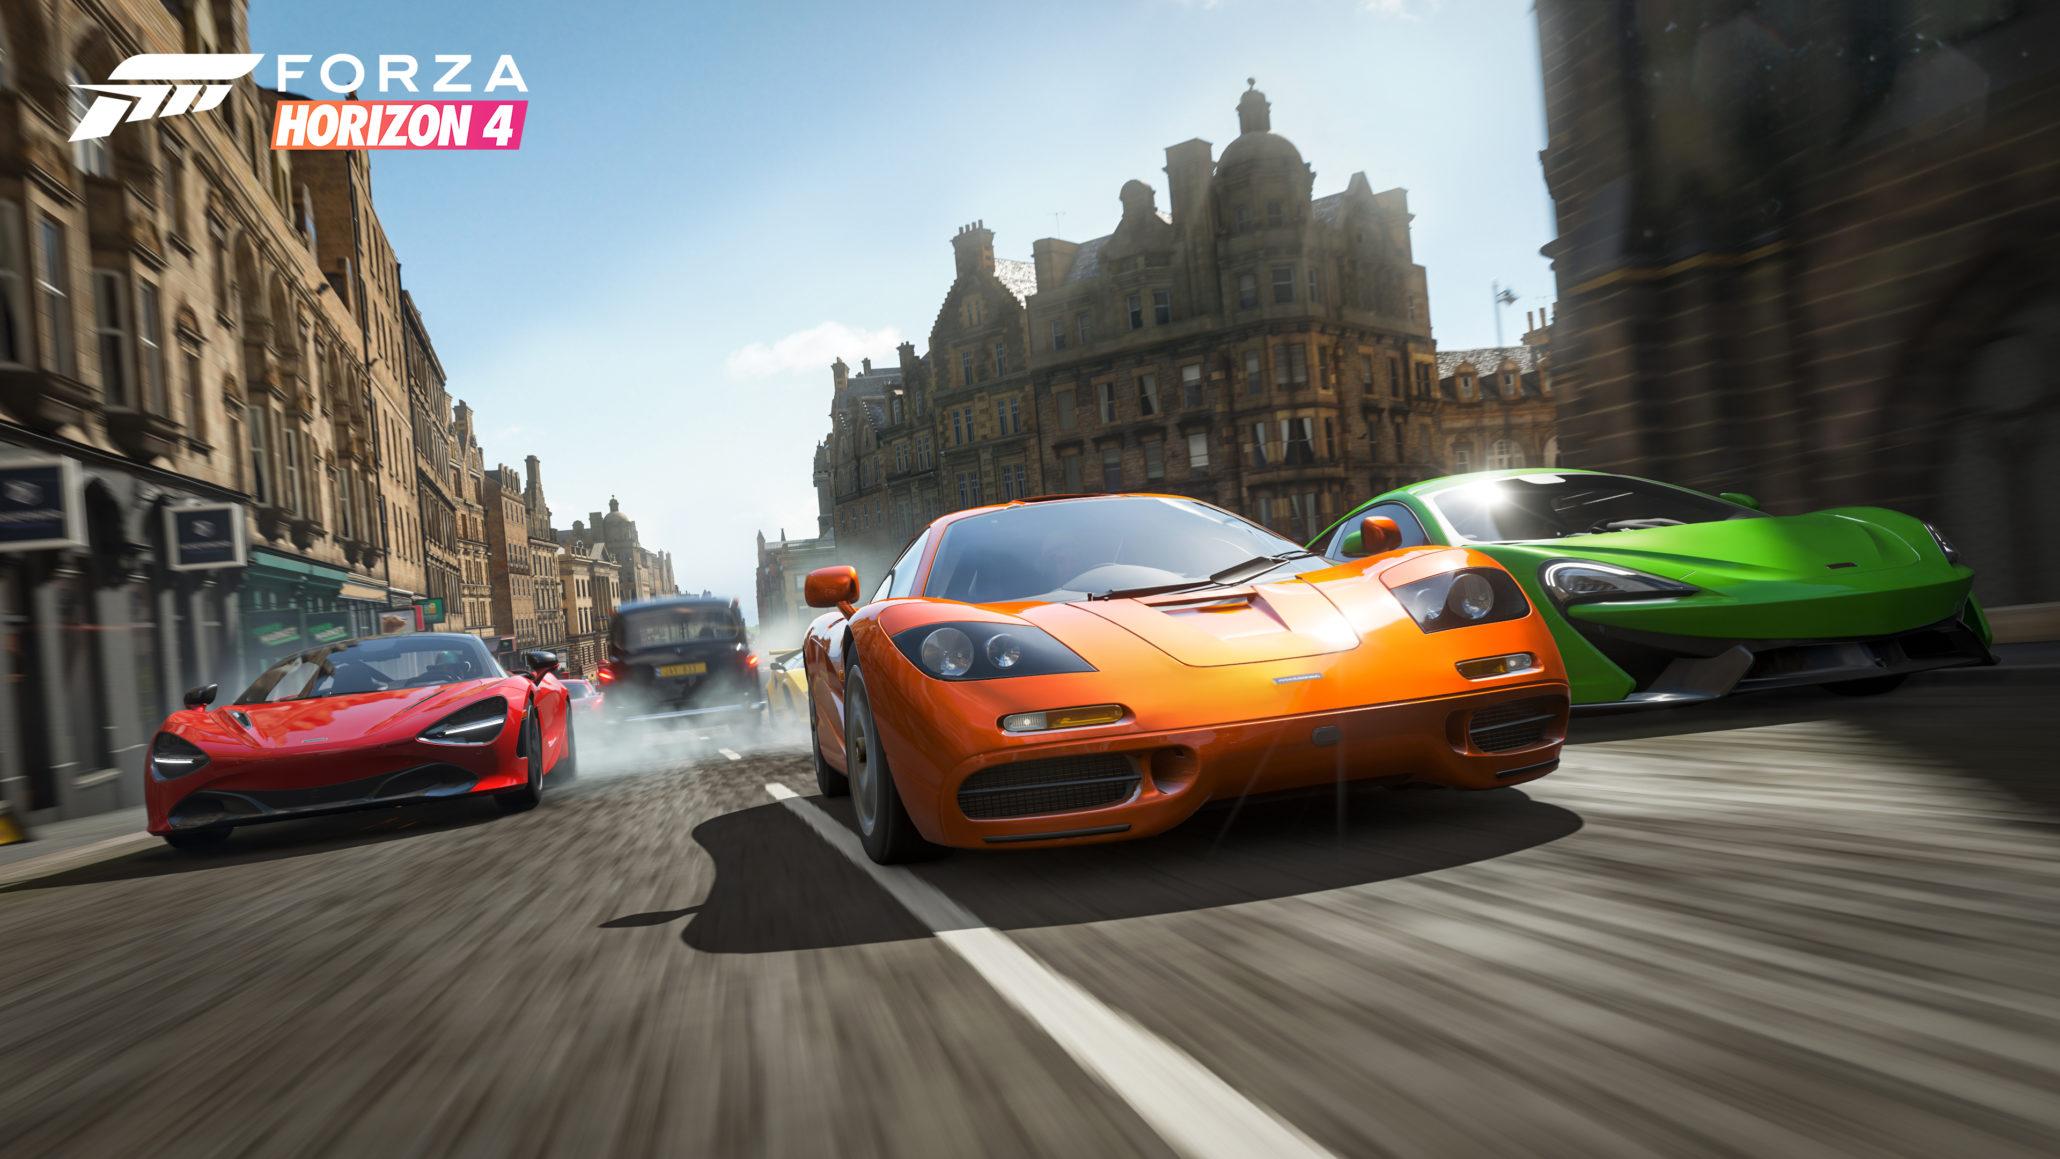 Forza Horizon 4 Gamescom Preview 04 Racing Through Edinburgh 2060x1159